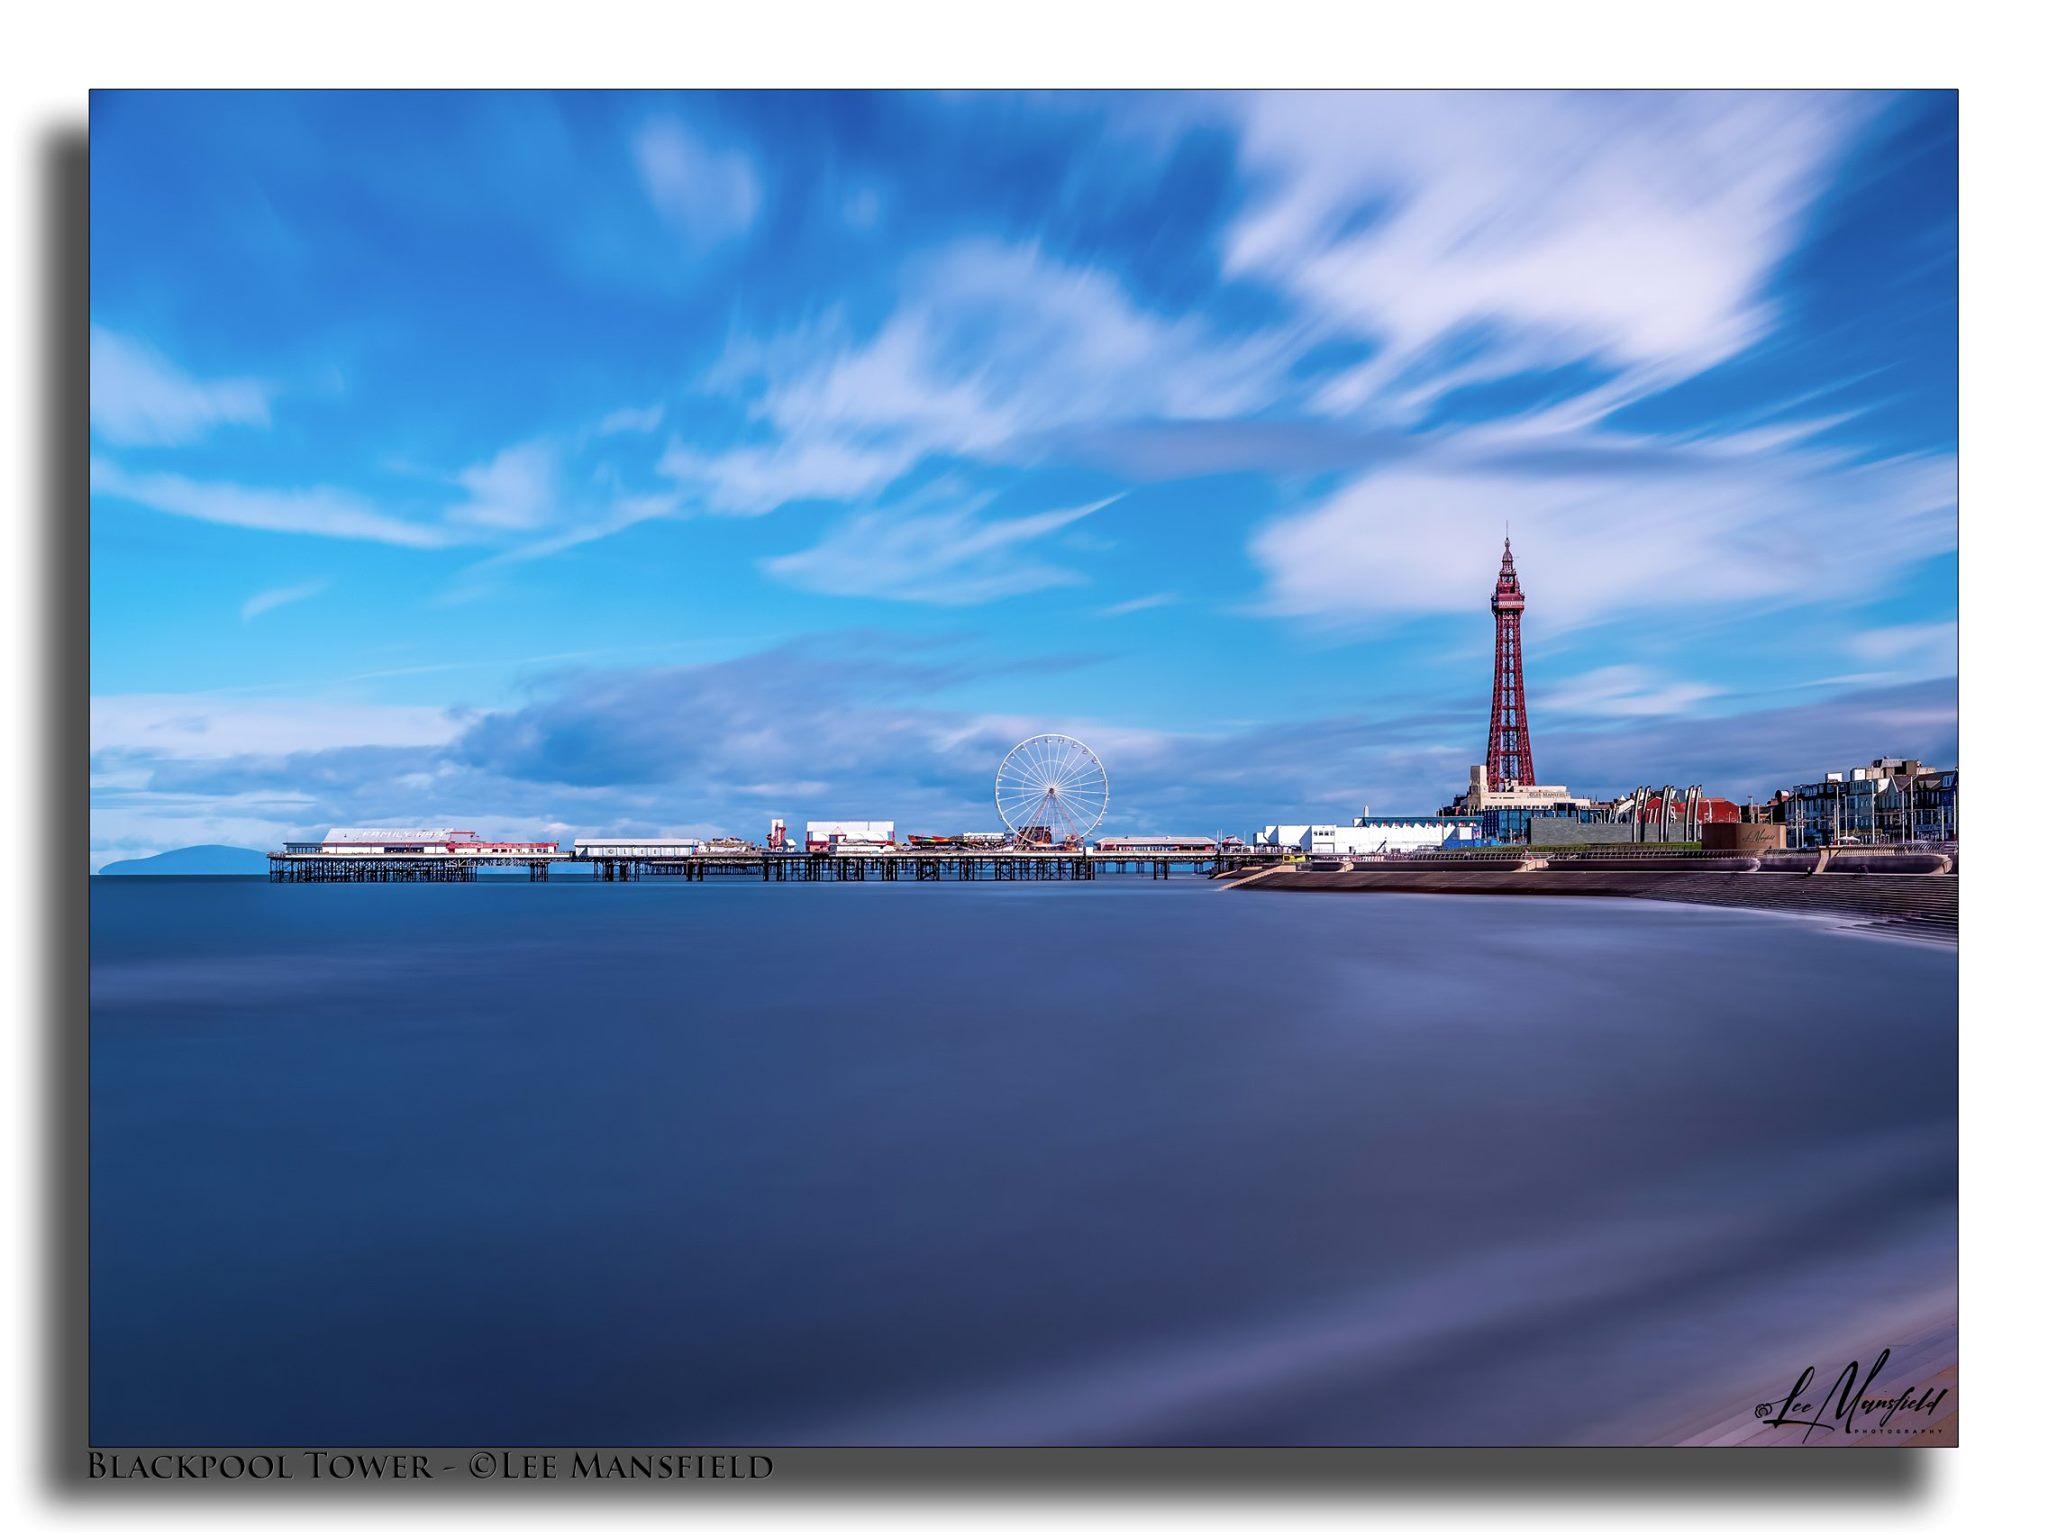 Blackpool Tower - long exposure landscape version